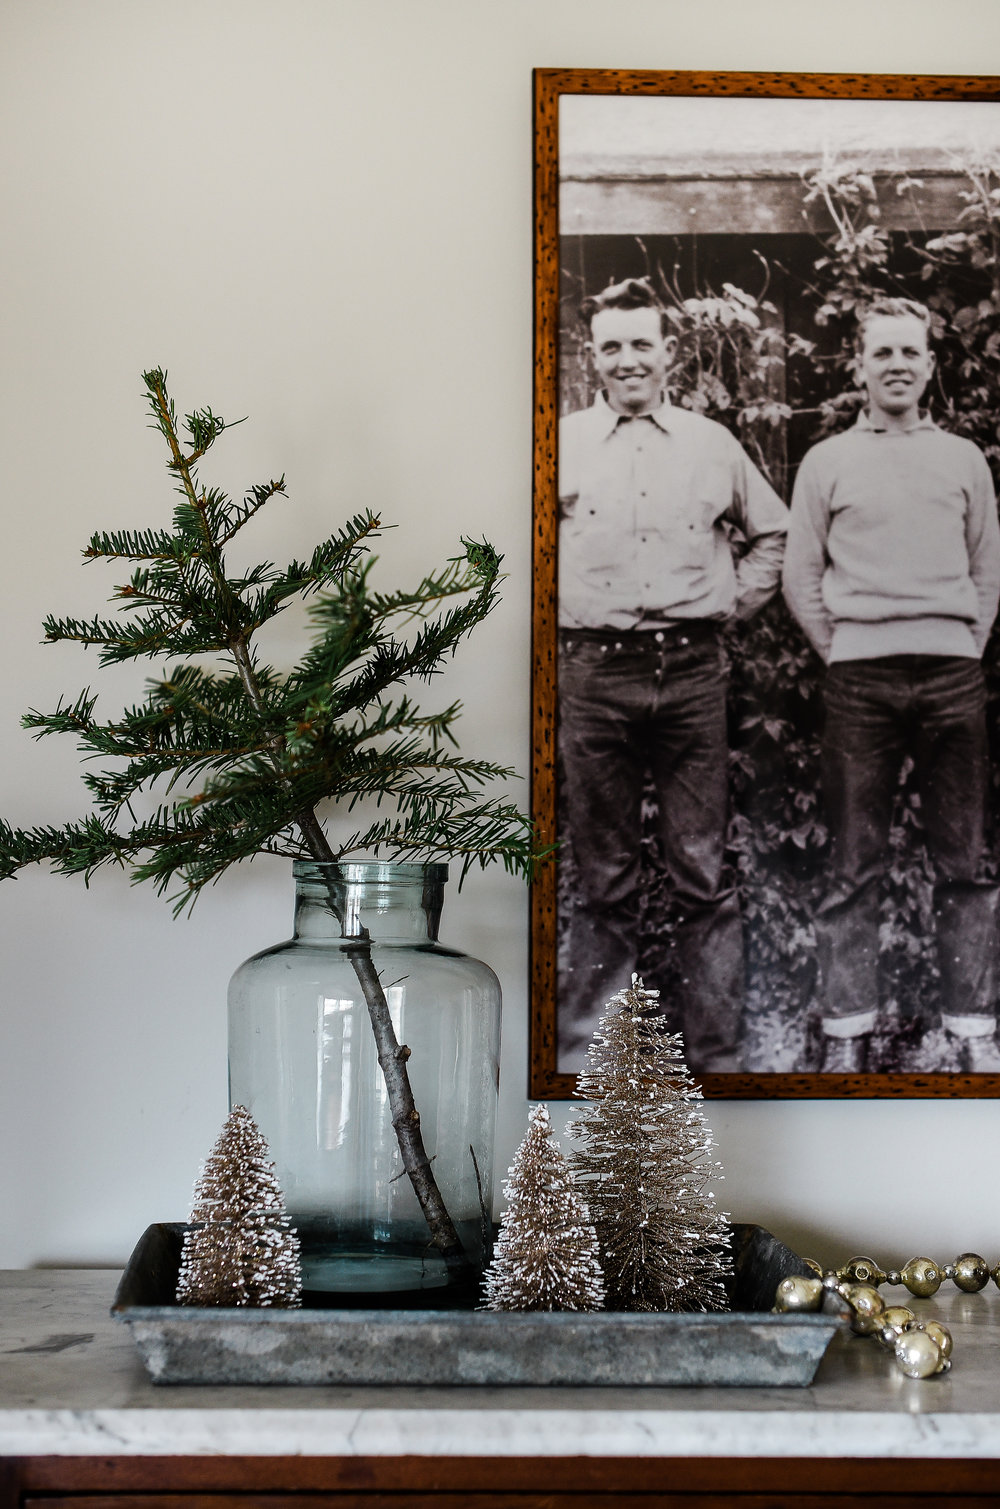 Farmhouse Christmas decorating ideas from boxwoodavenue.com